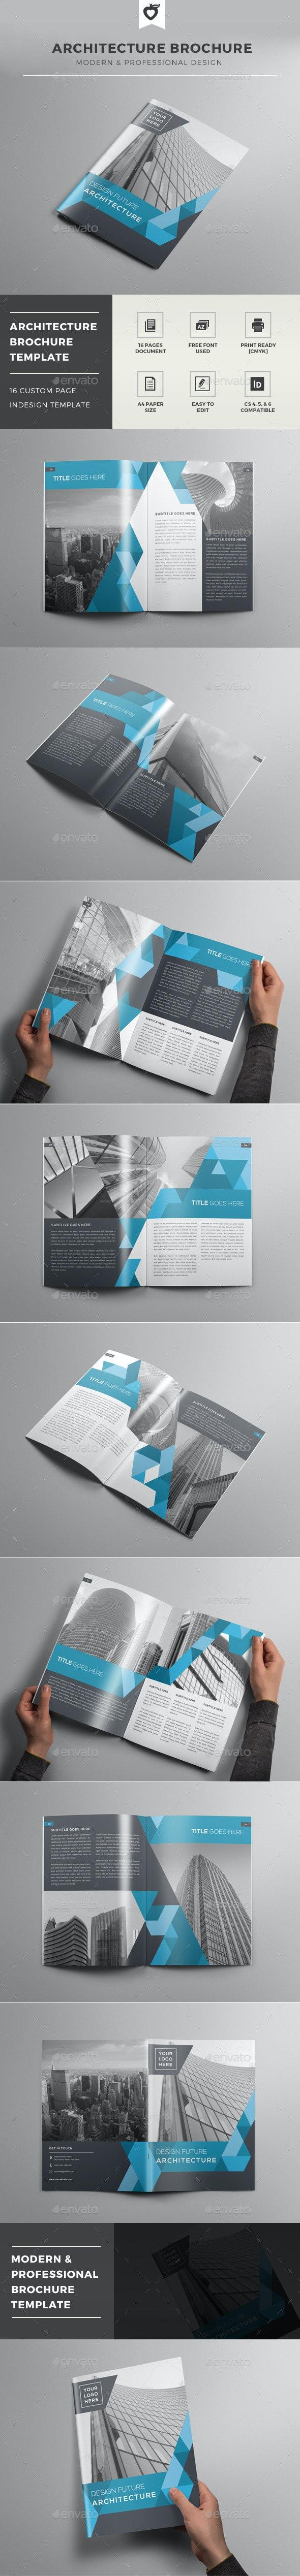 Architecture Brochure - Corporate Brochures